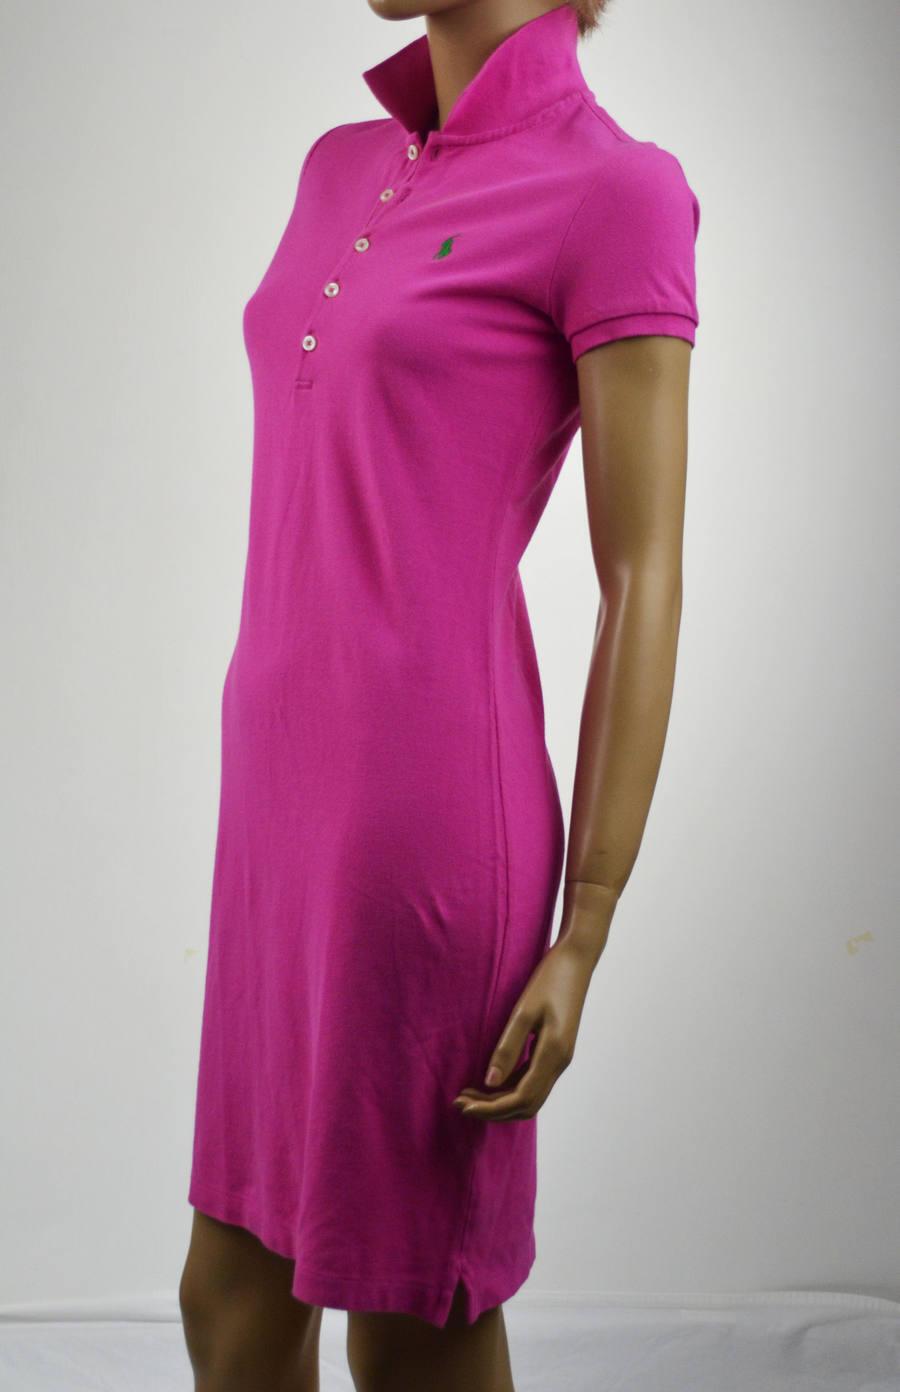 Ralph Lauren Fushia Rosa Polo Dress Grün  Pony -XSmall -NWT